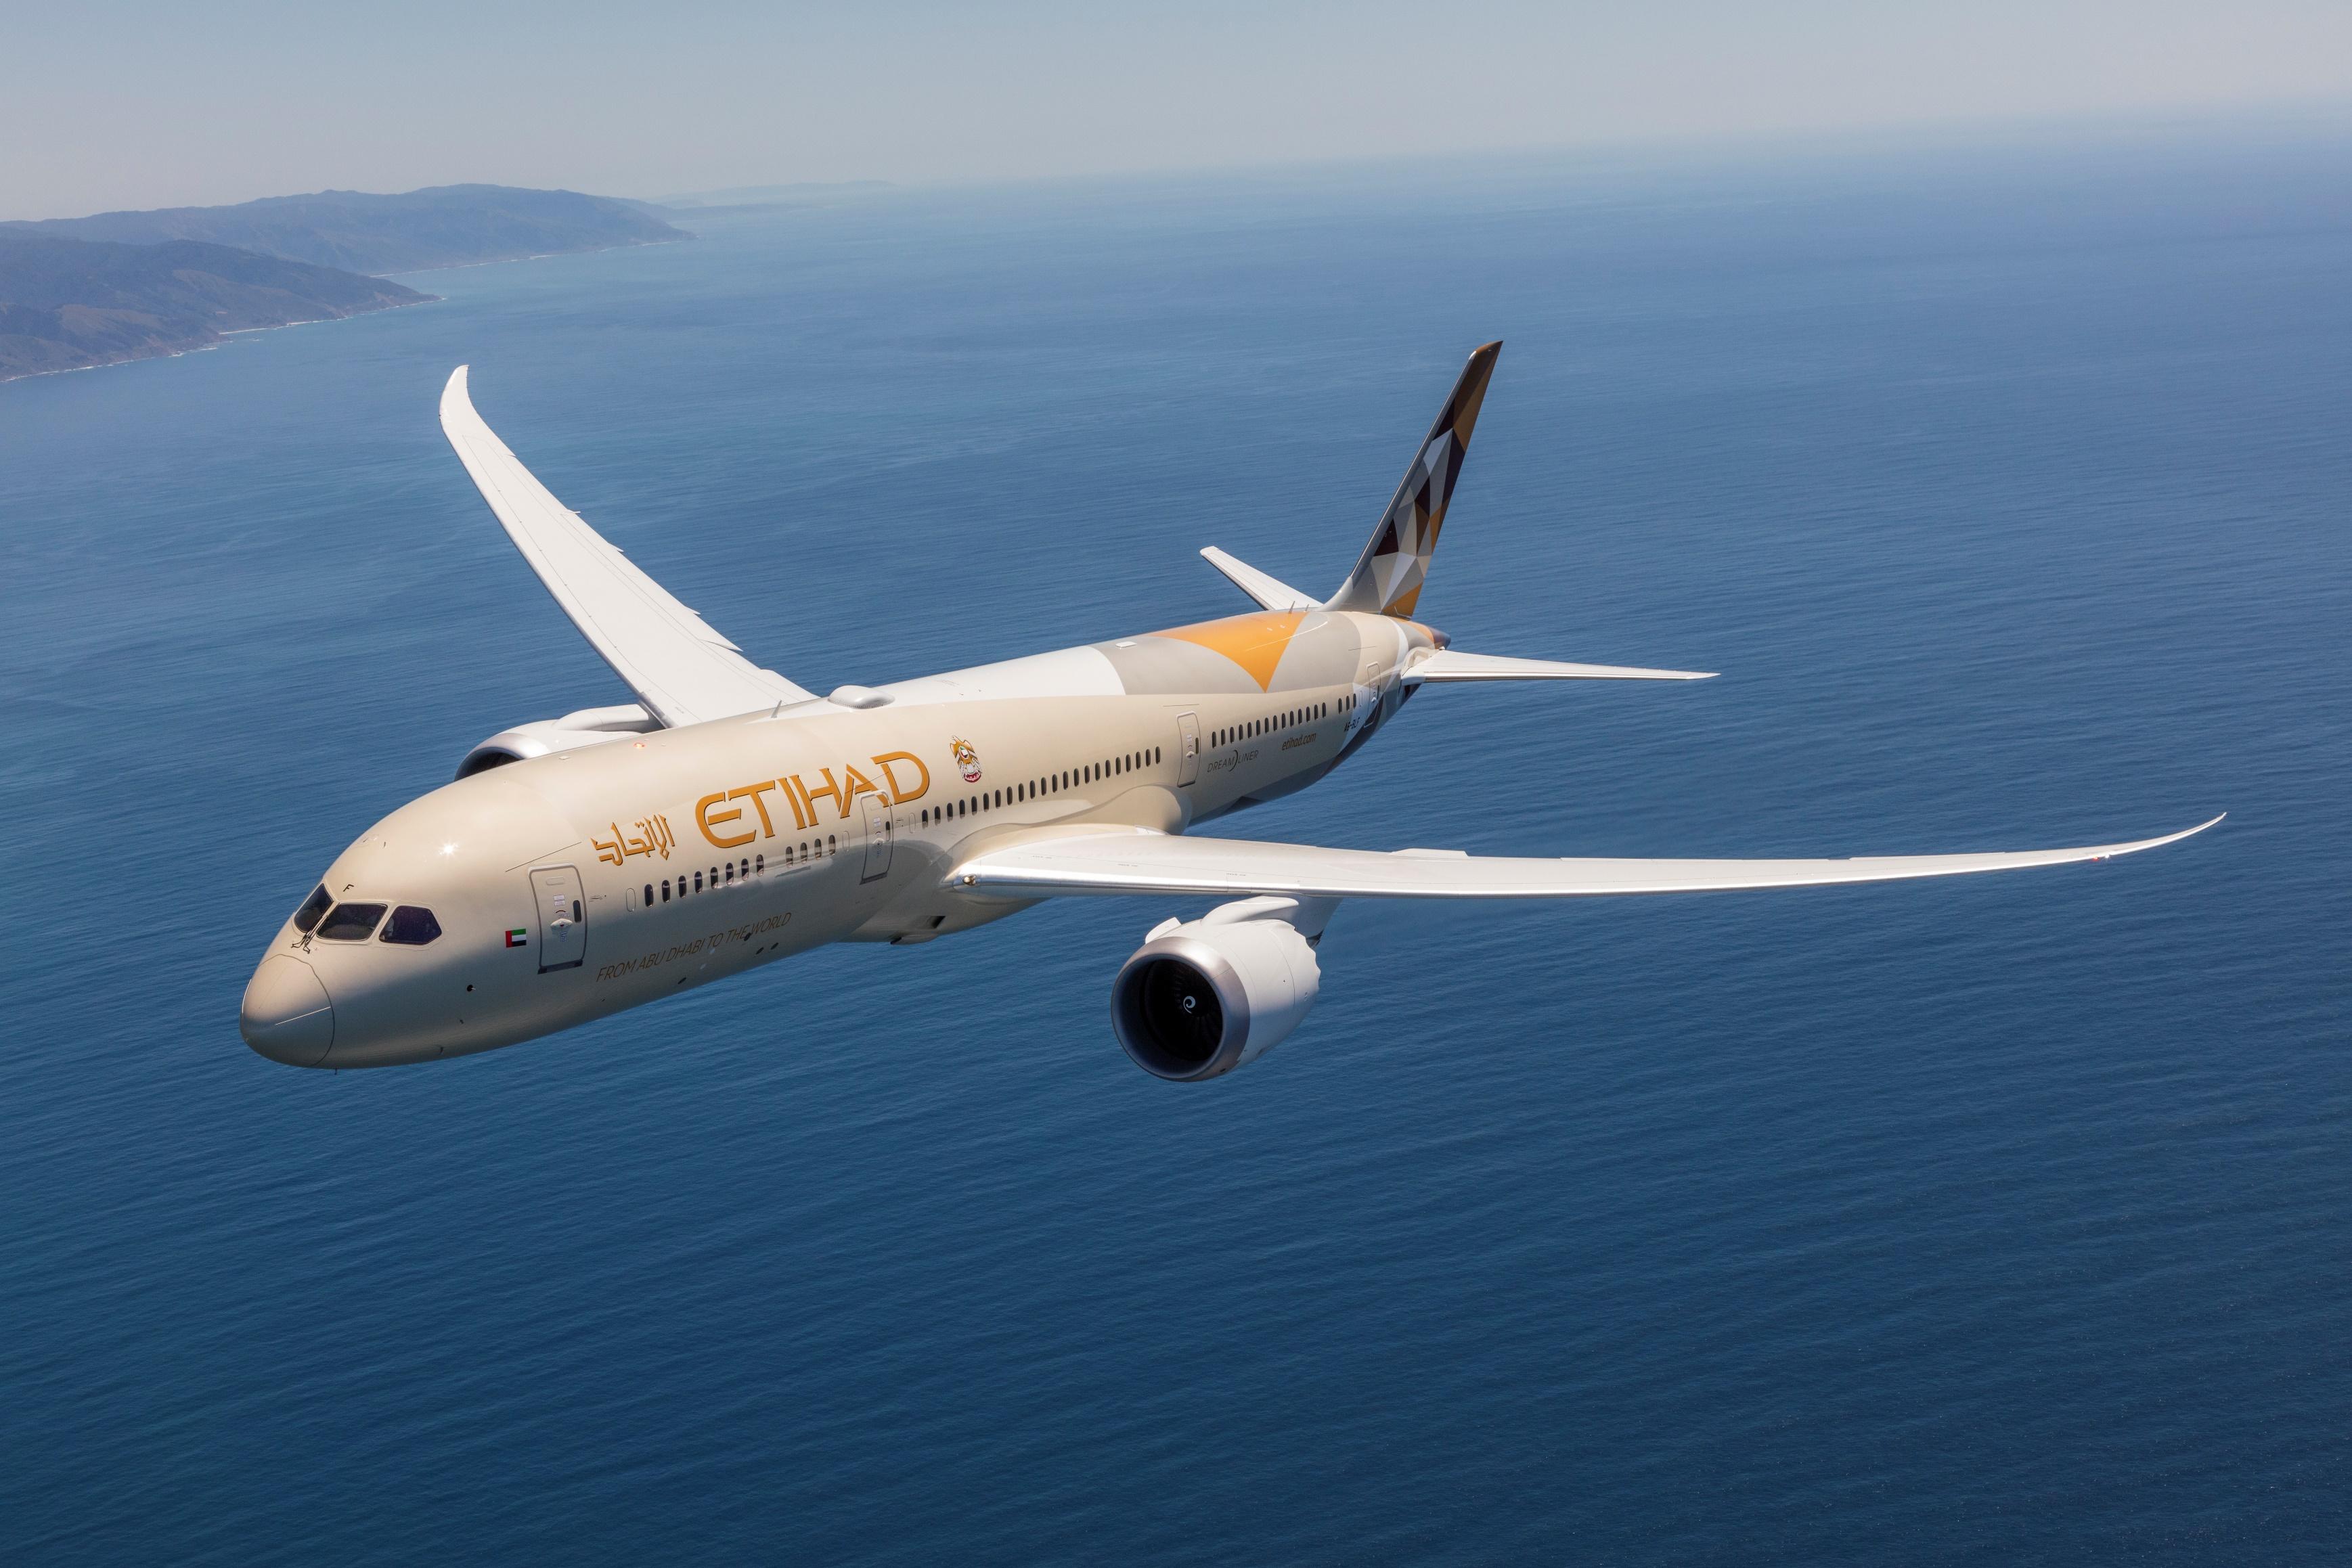 etihad airways introduces its boeing 787-9 dreamliner to lagos